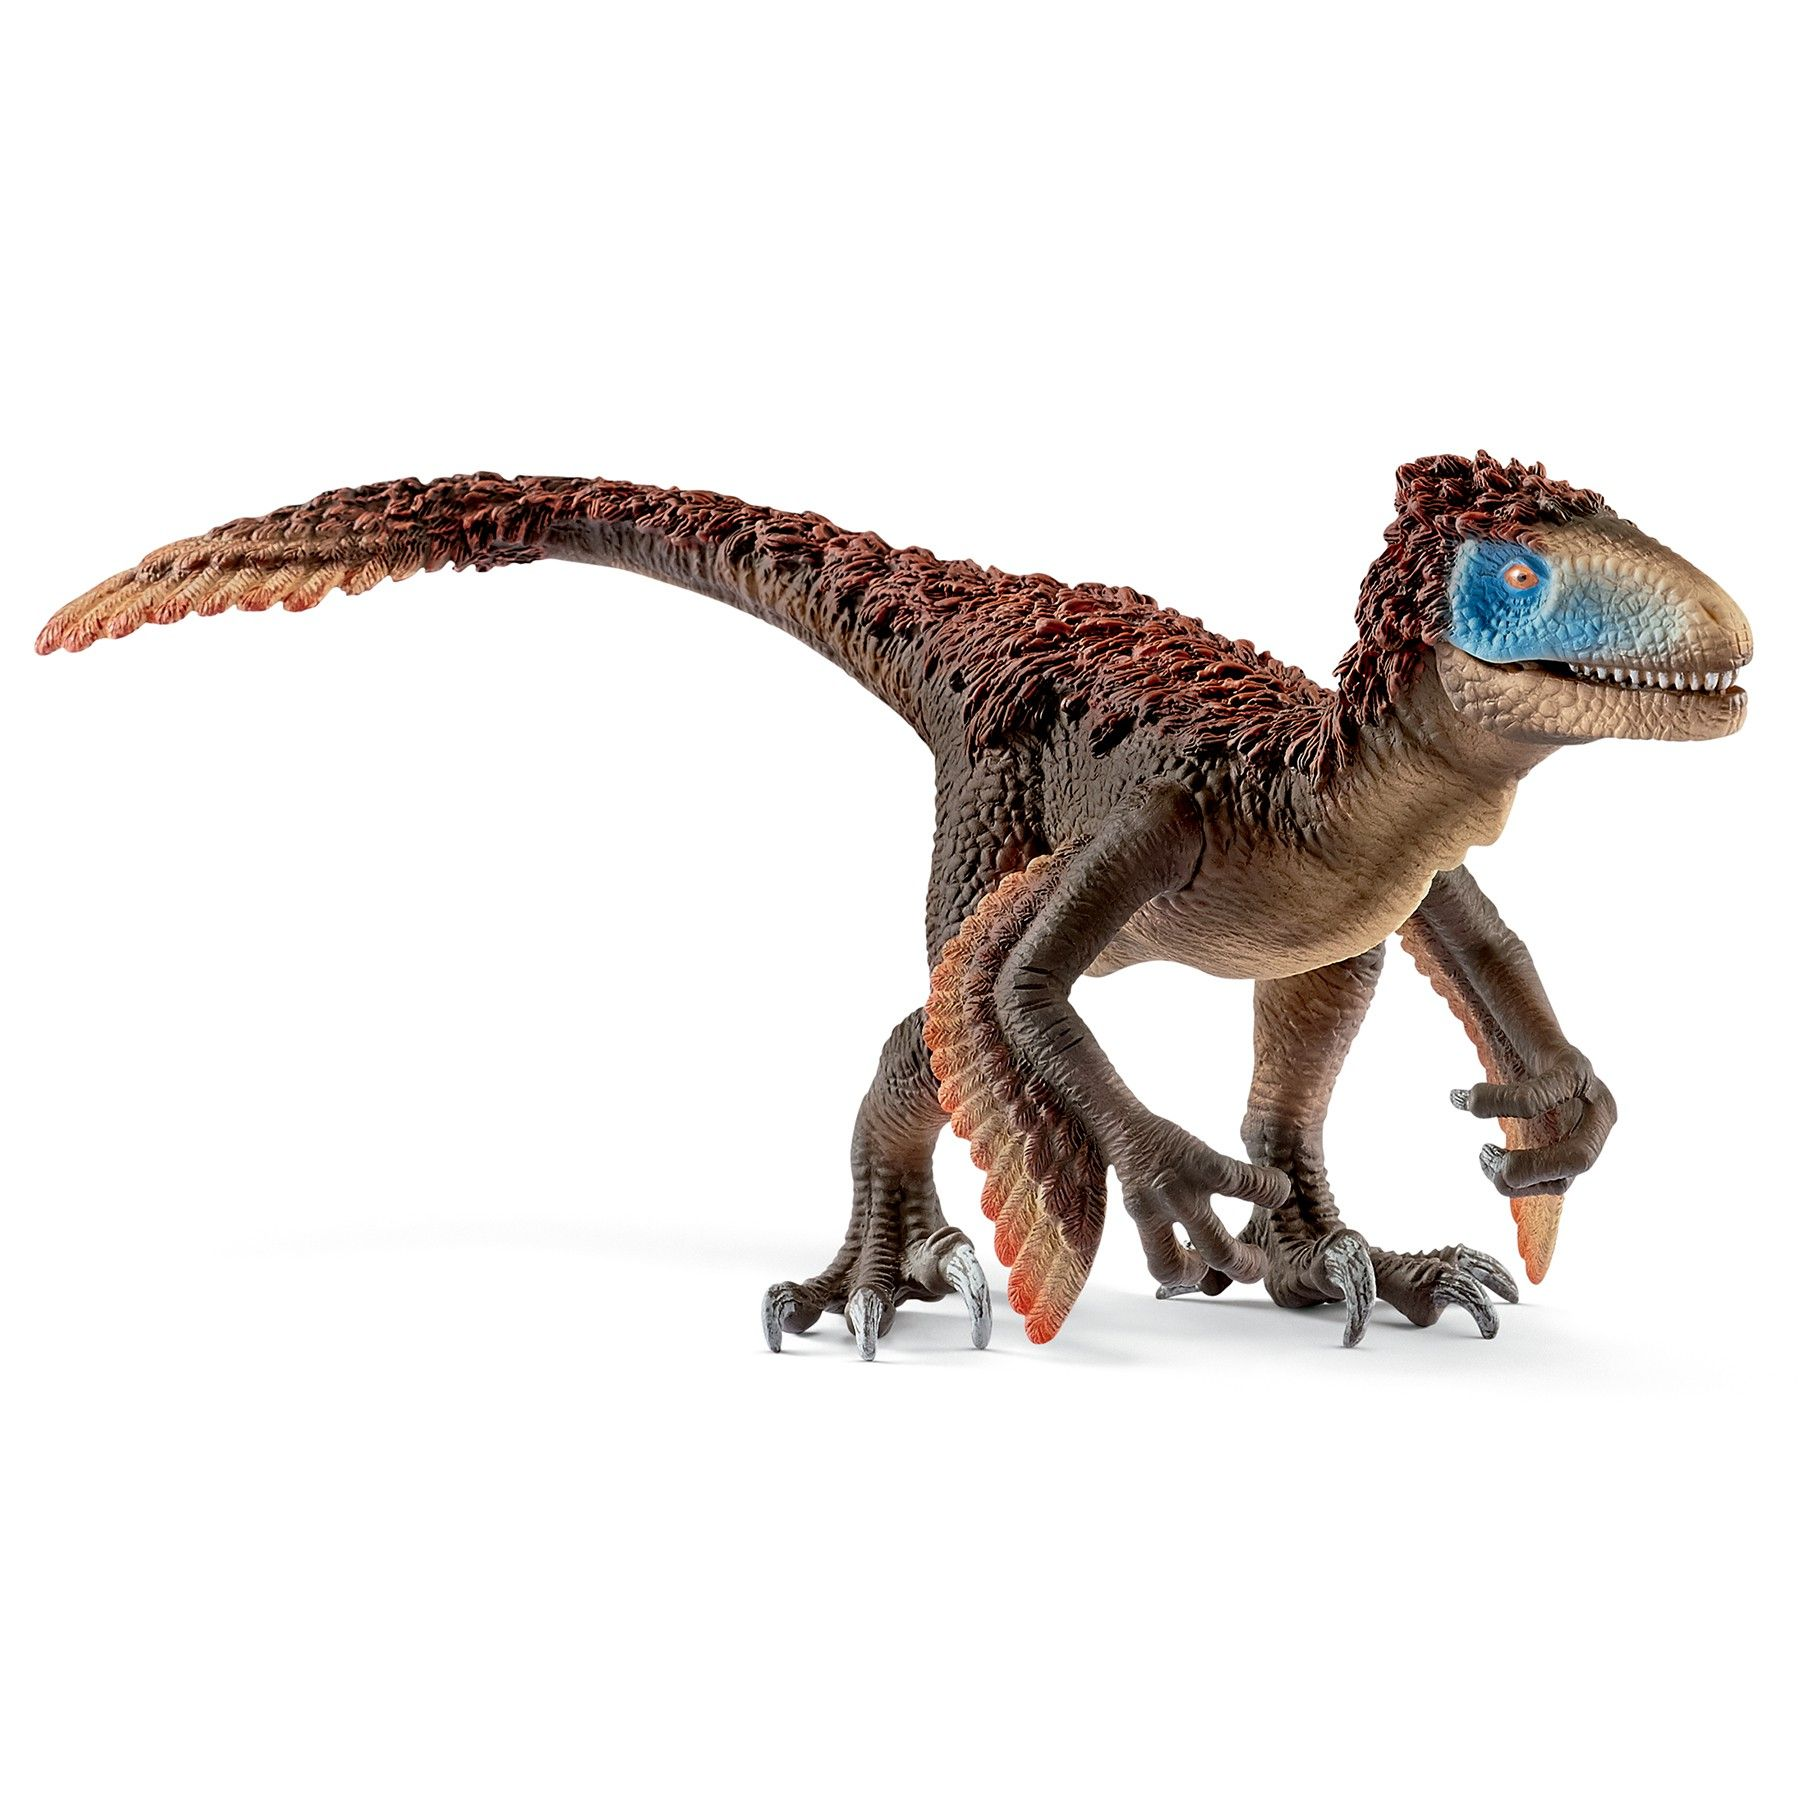 Фигурка Dinosaurs - Ютараптор, длина 21 см